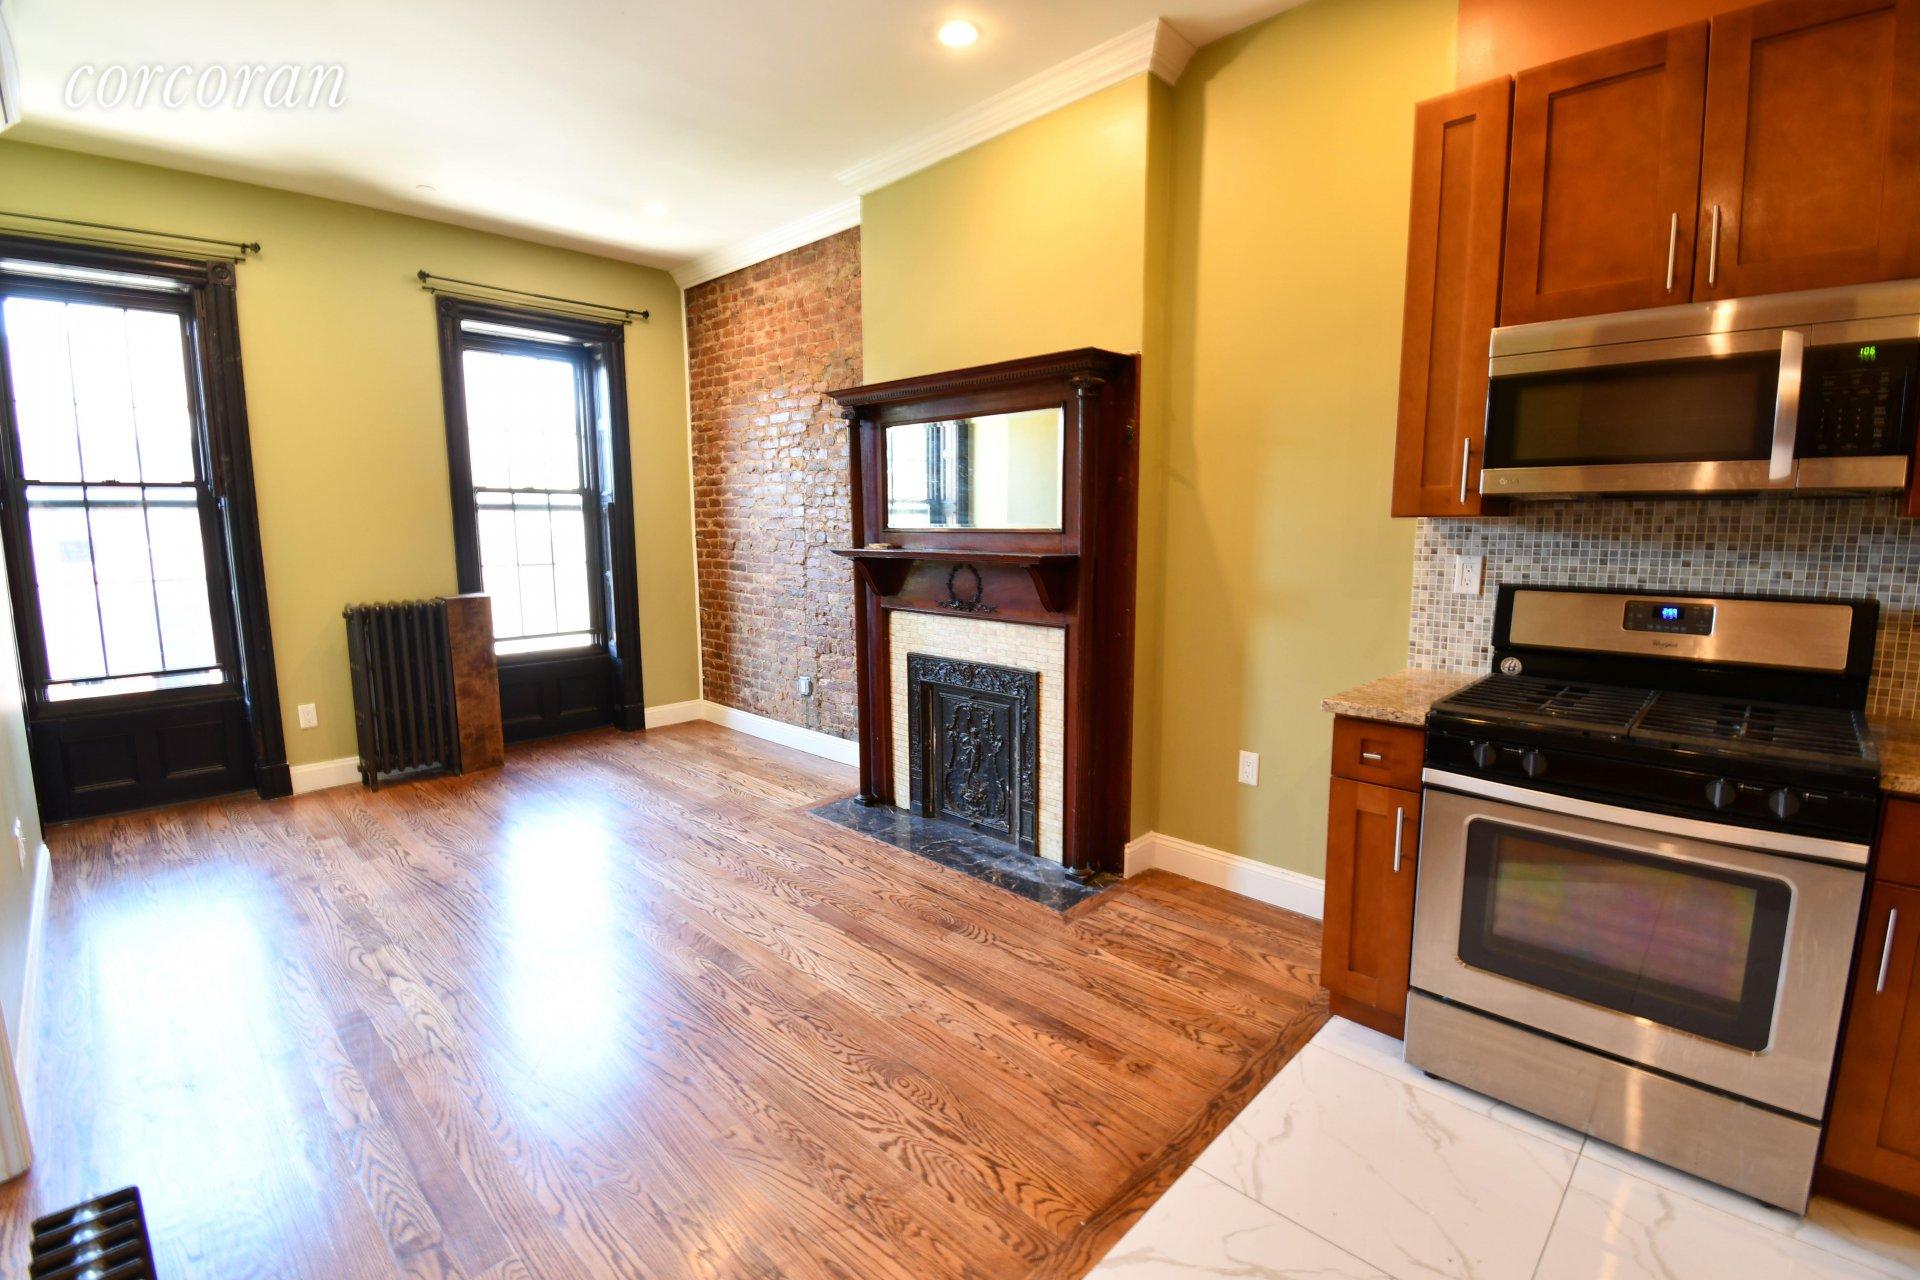 Ad Rental Apartment Brooklyn (11221) ref:5802502